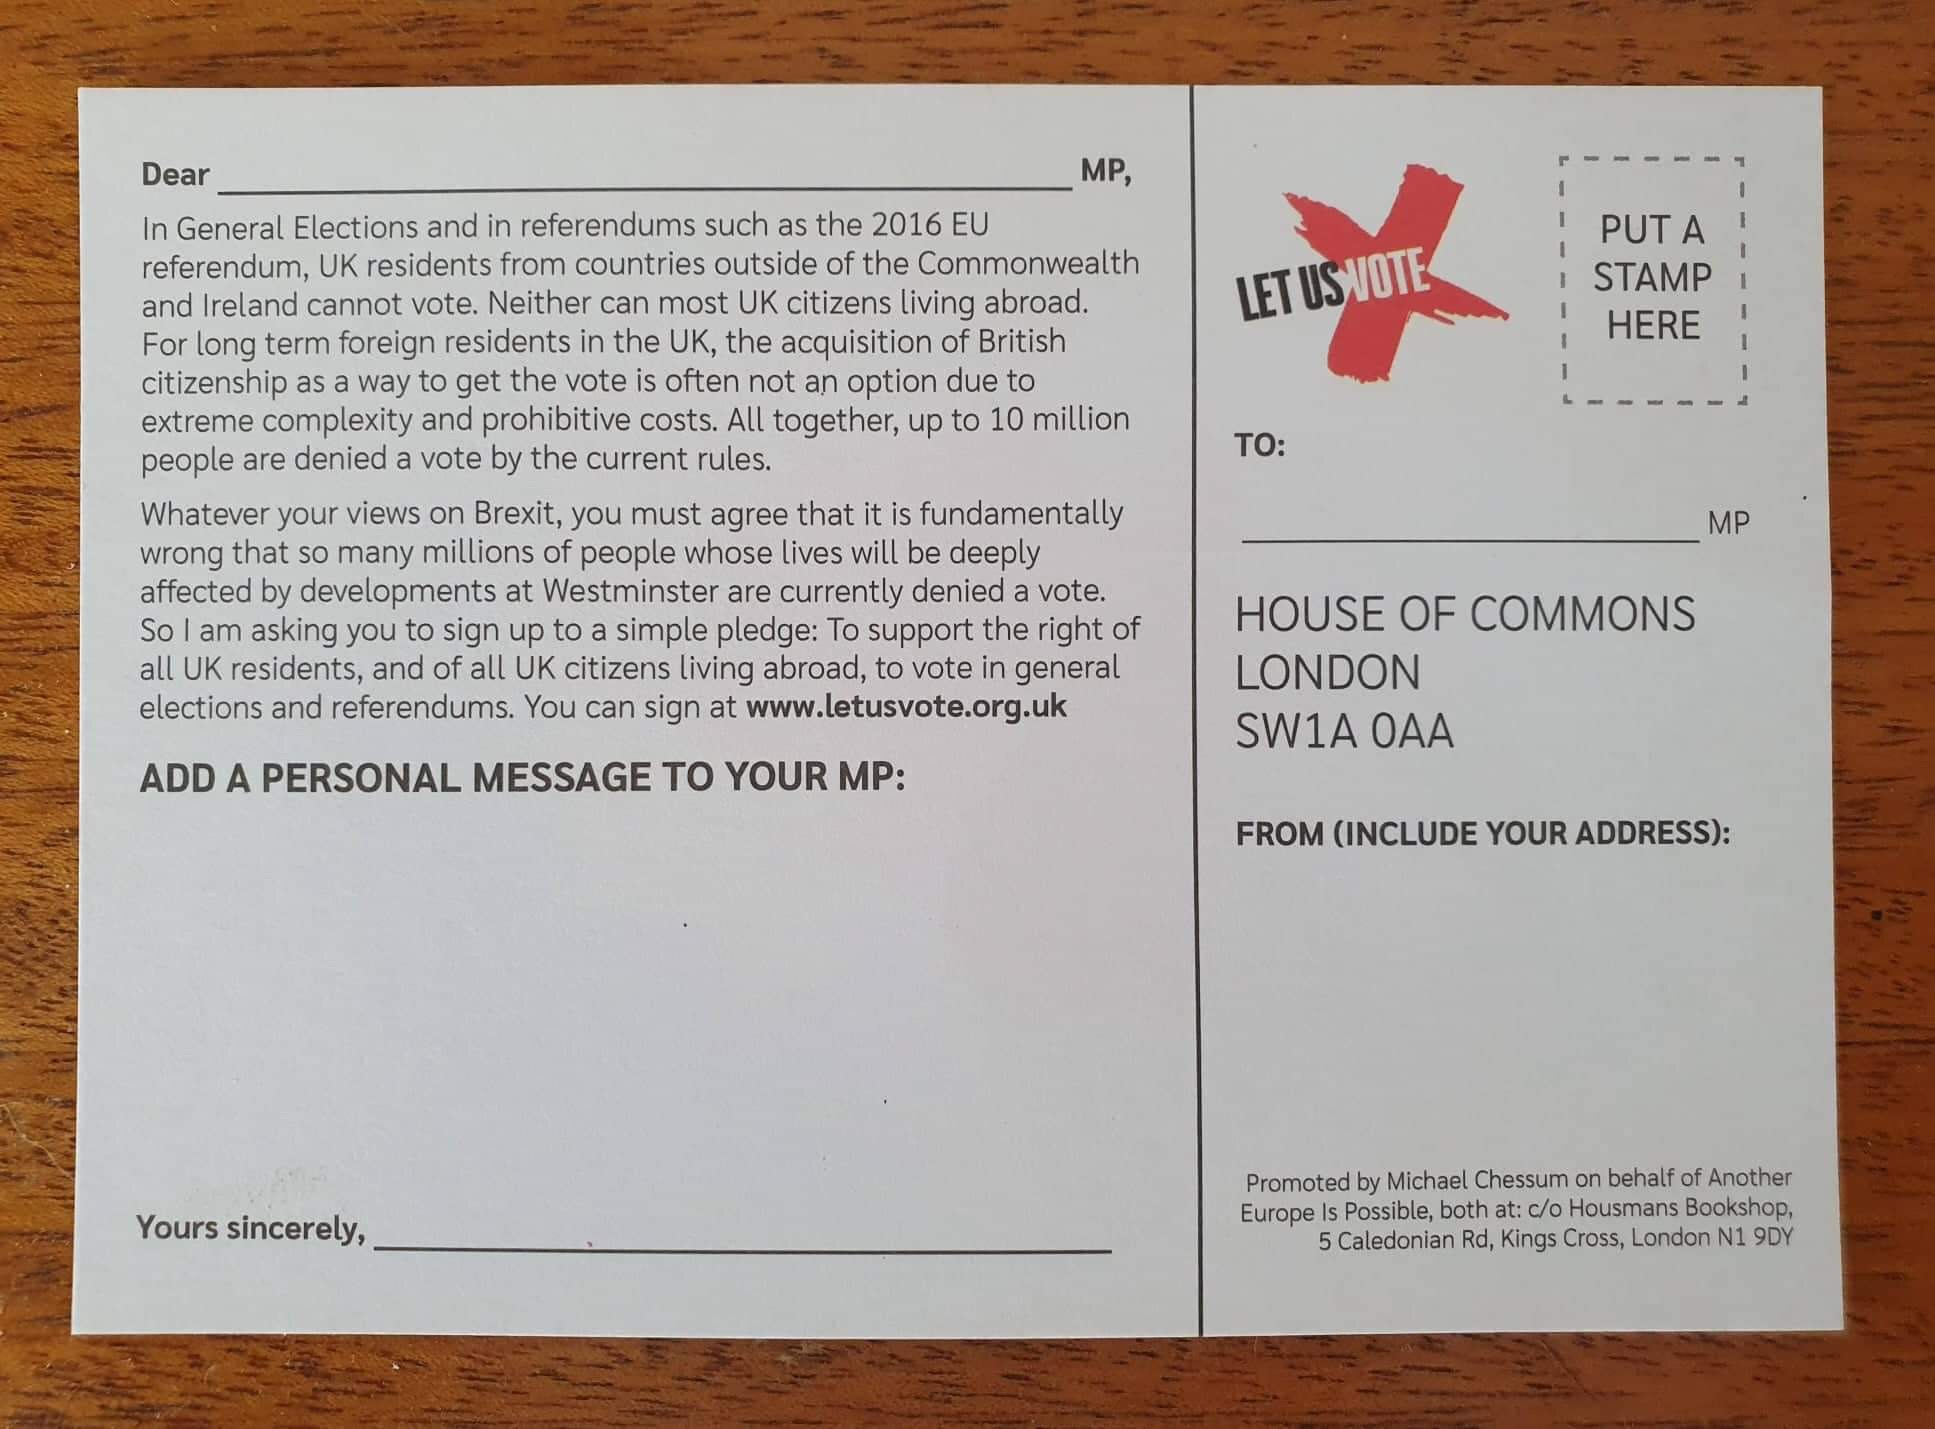 Let us vote postcard